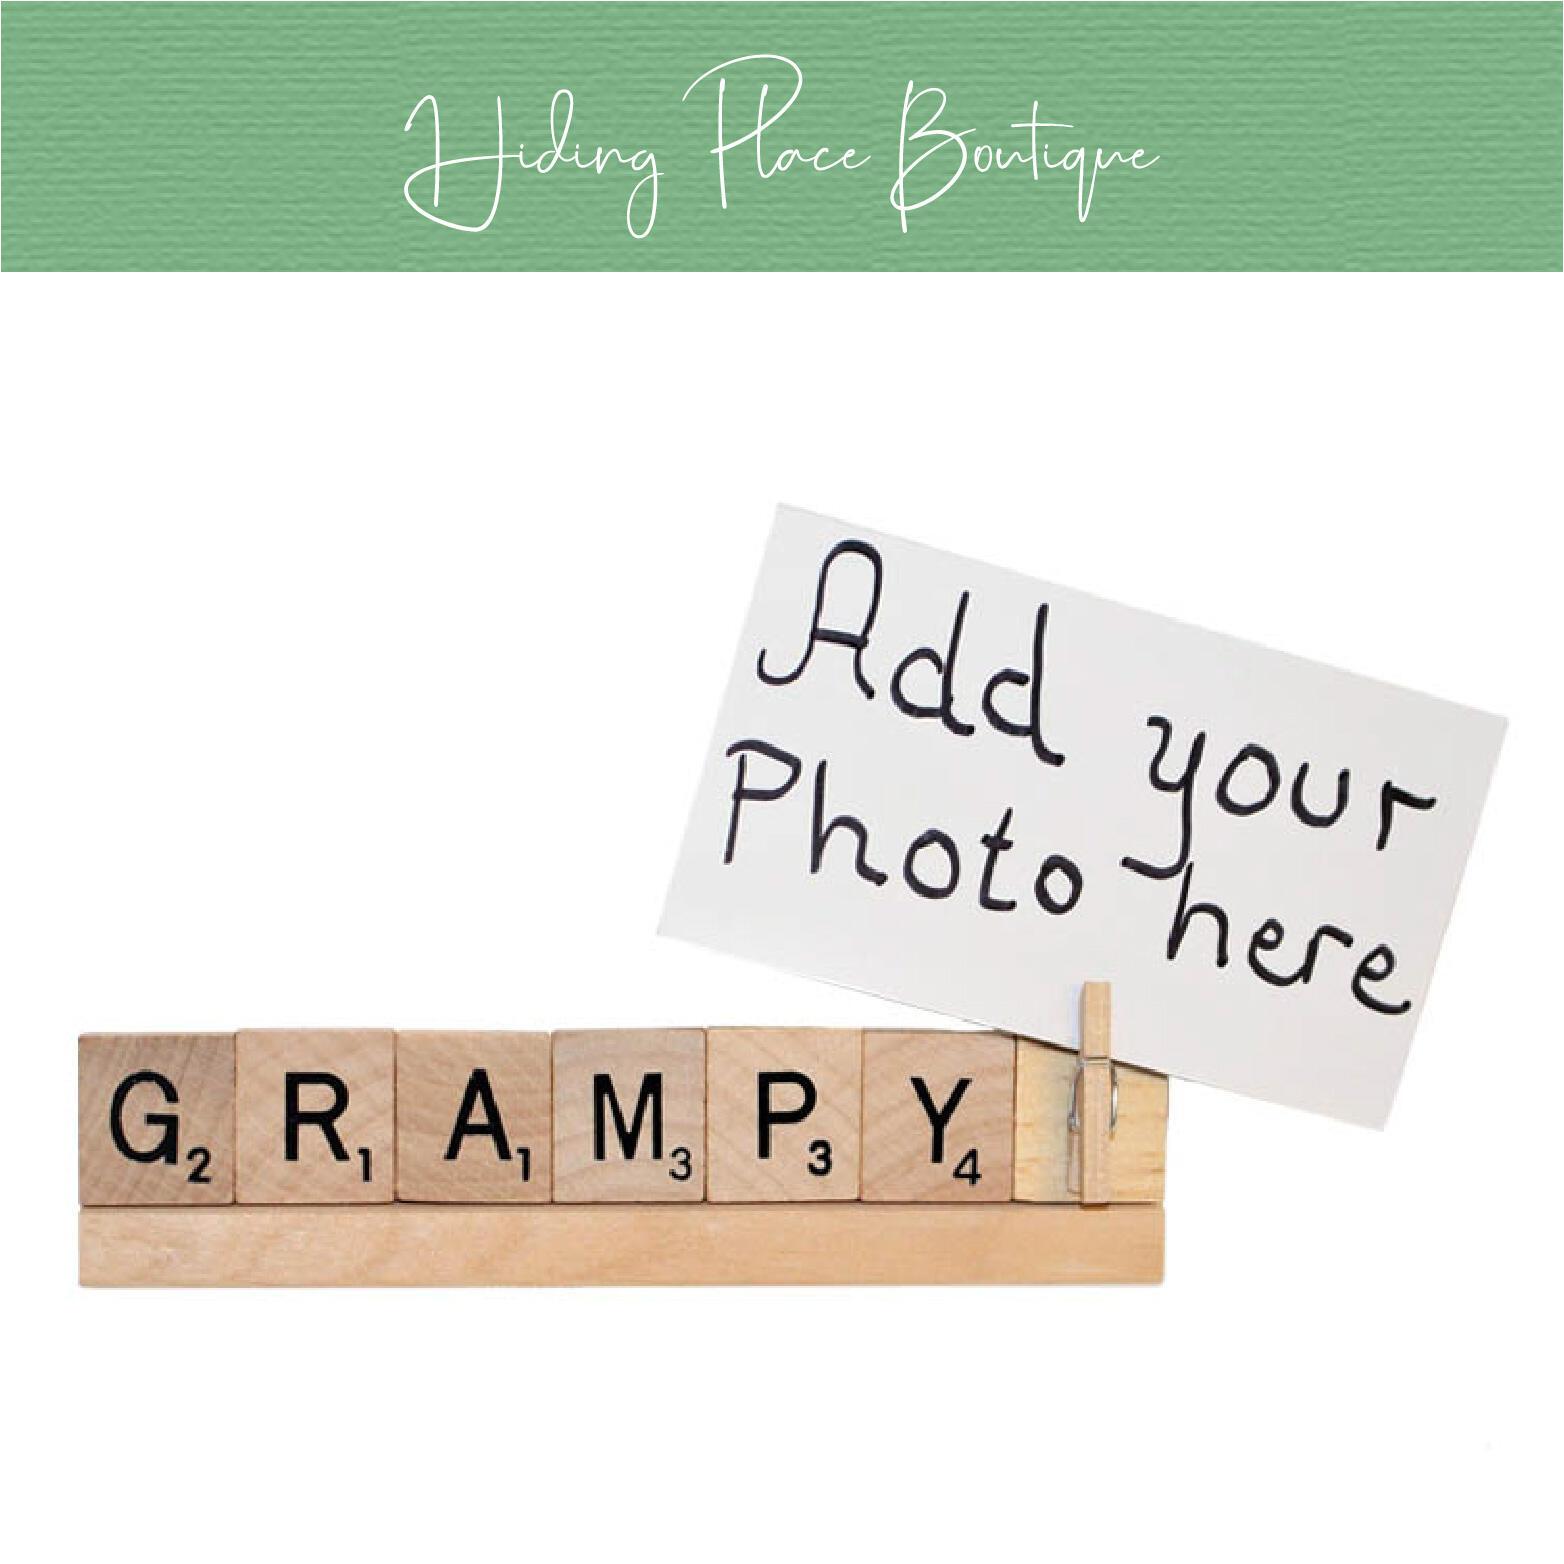 grampy photo frame